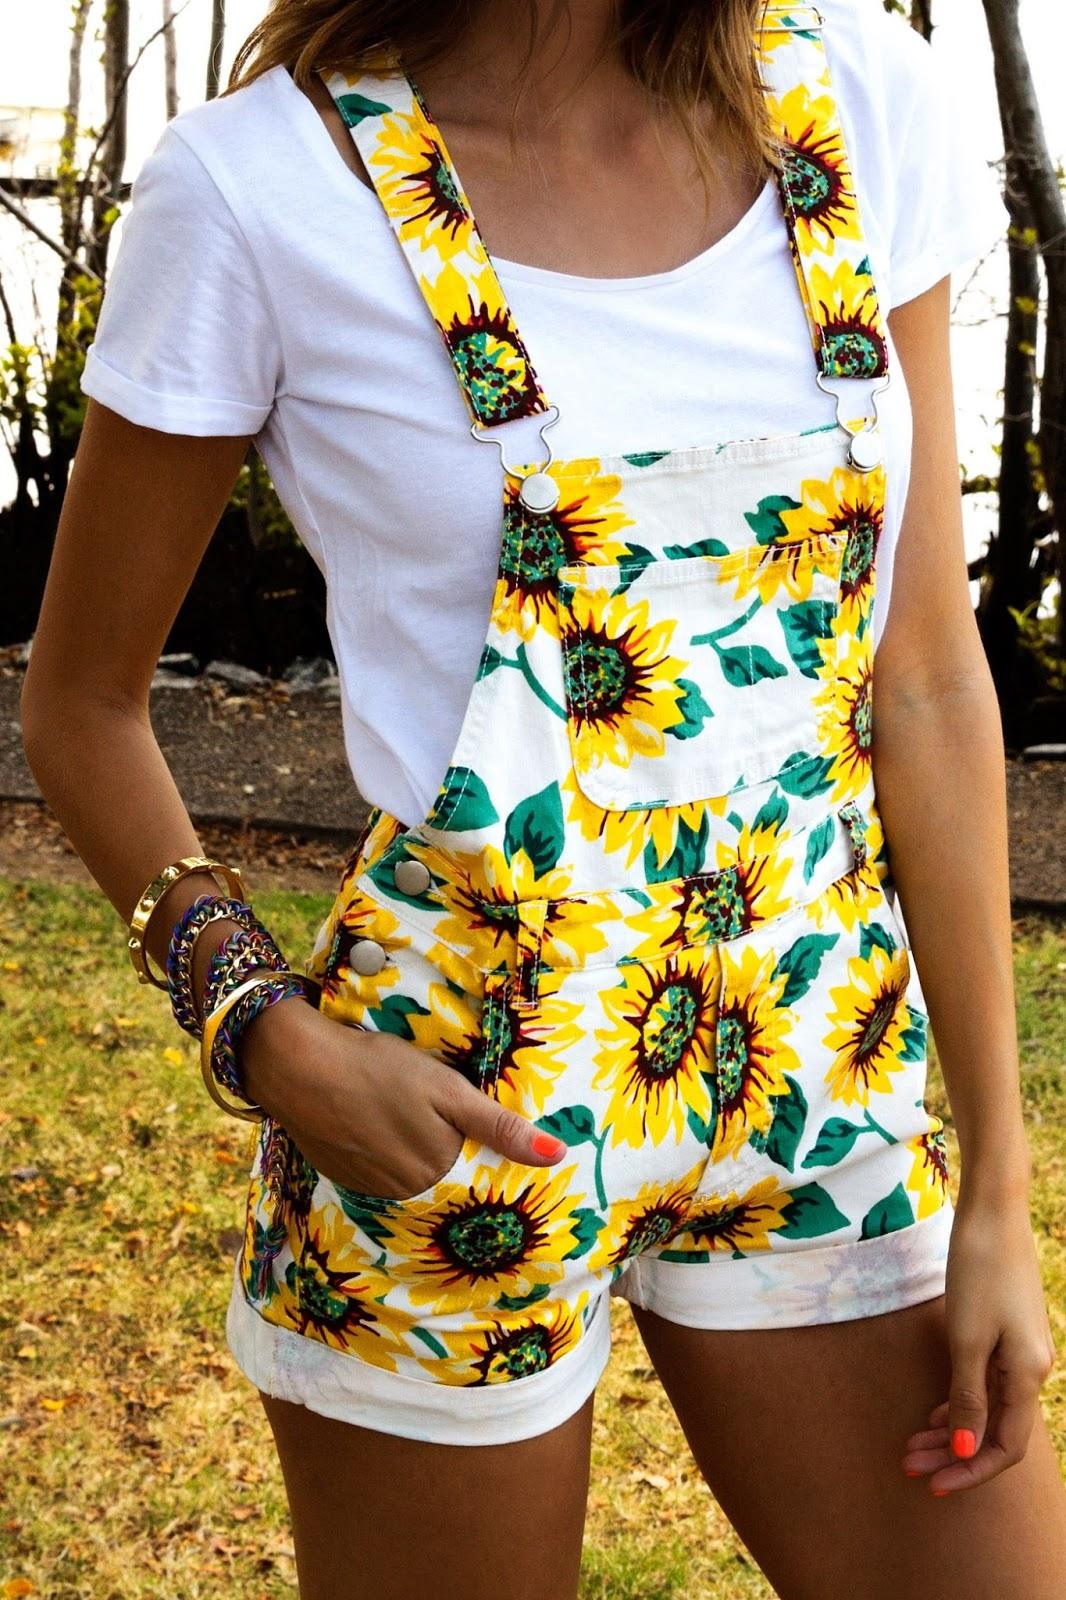 Sunflower Print High-Waisted Pockets Overall